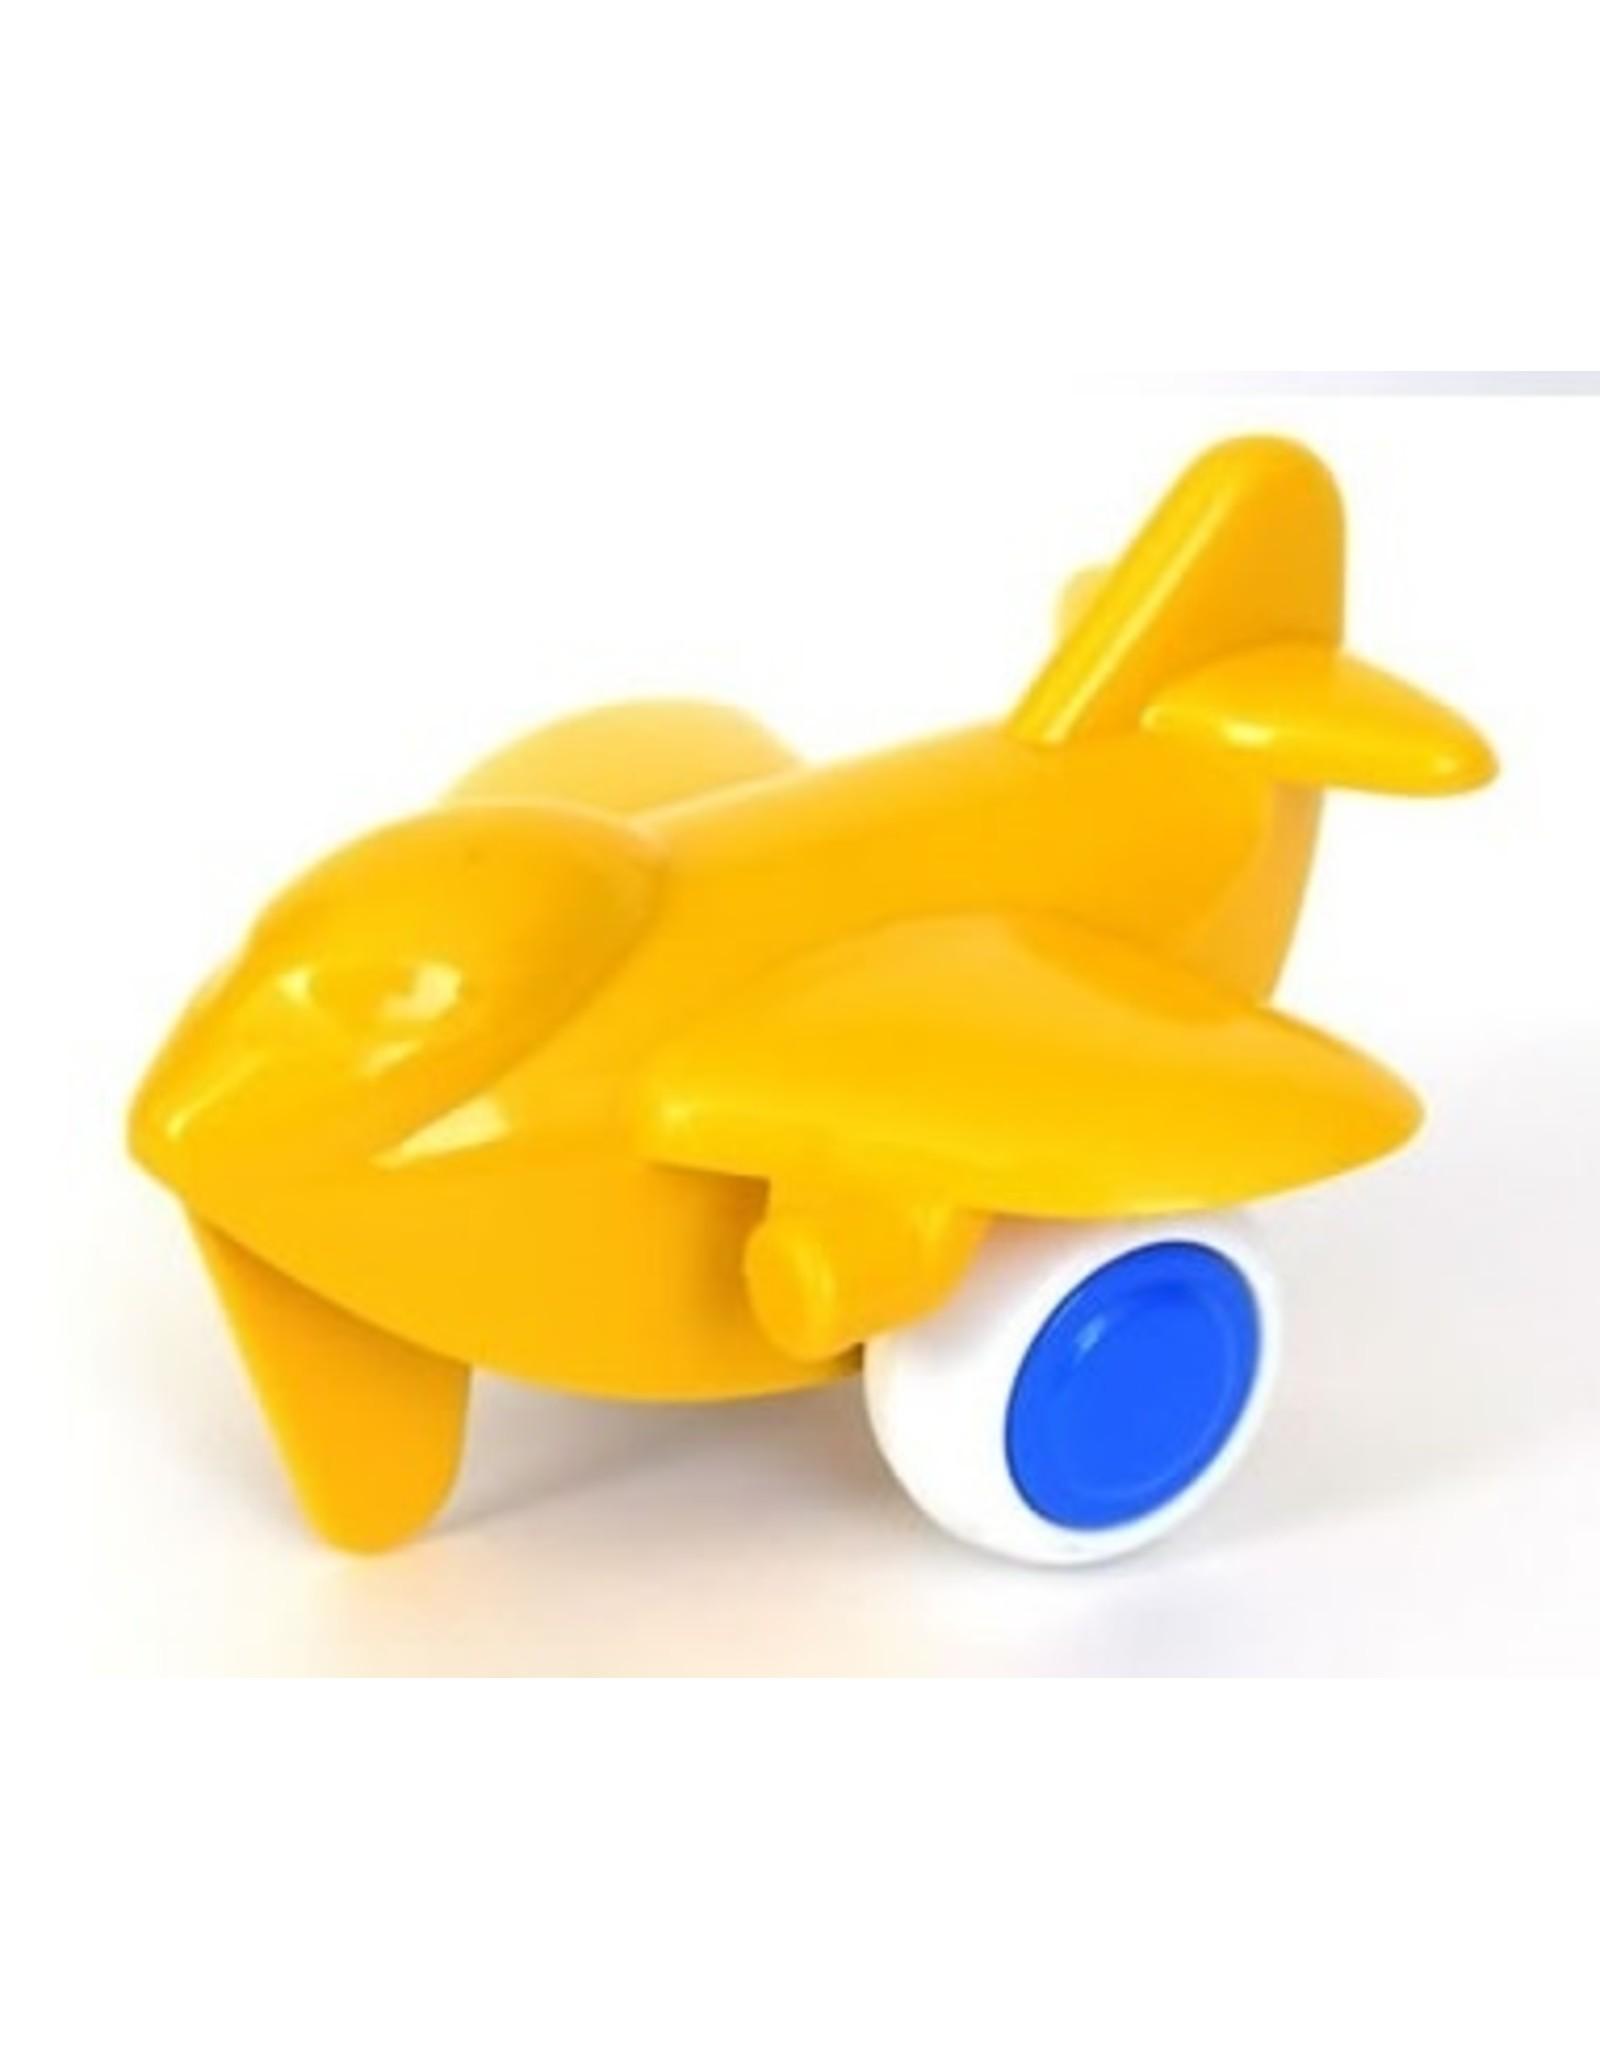 Vikingtoys - yellow airplaine (10cm)